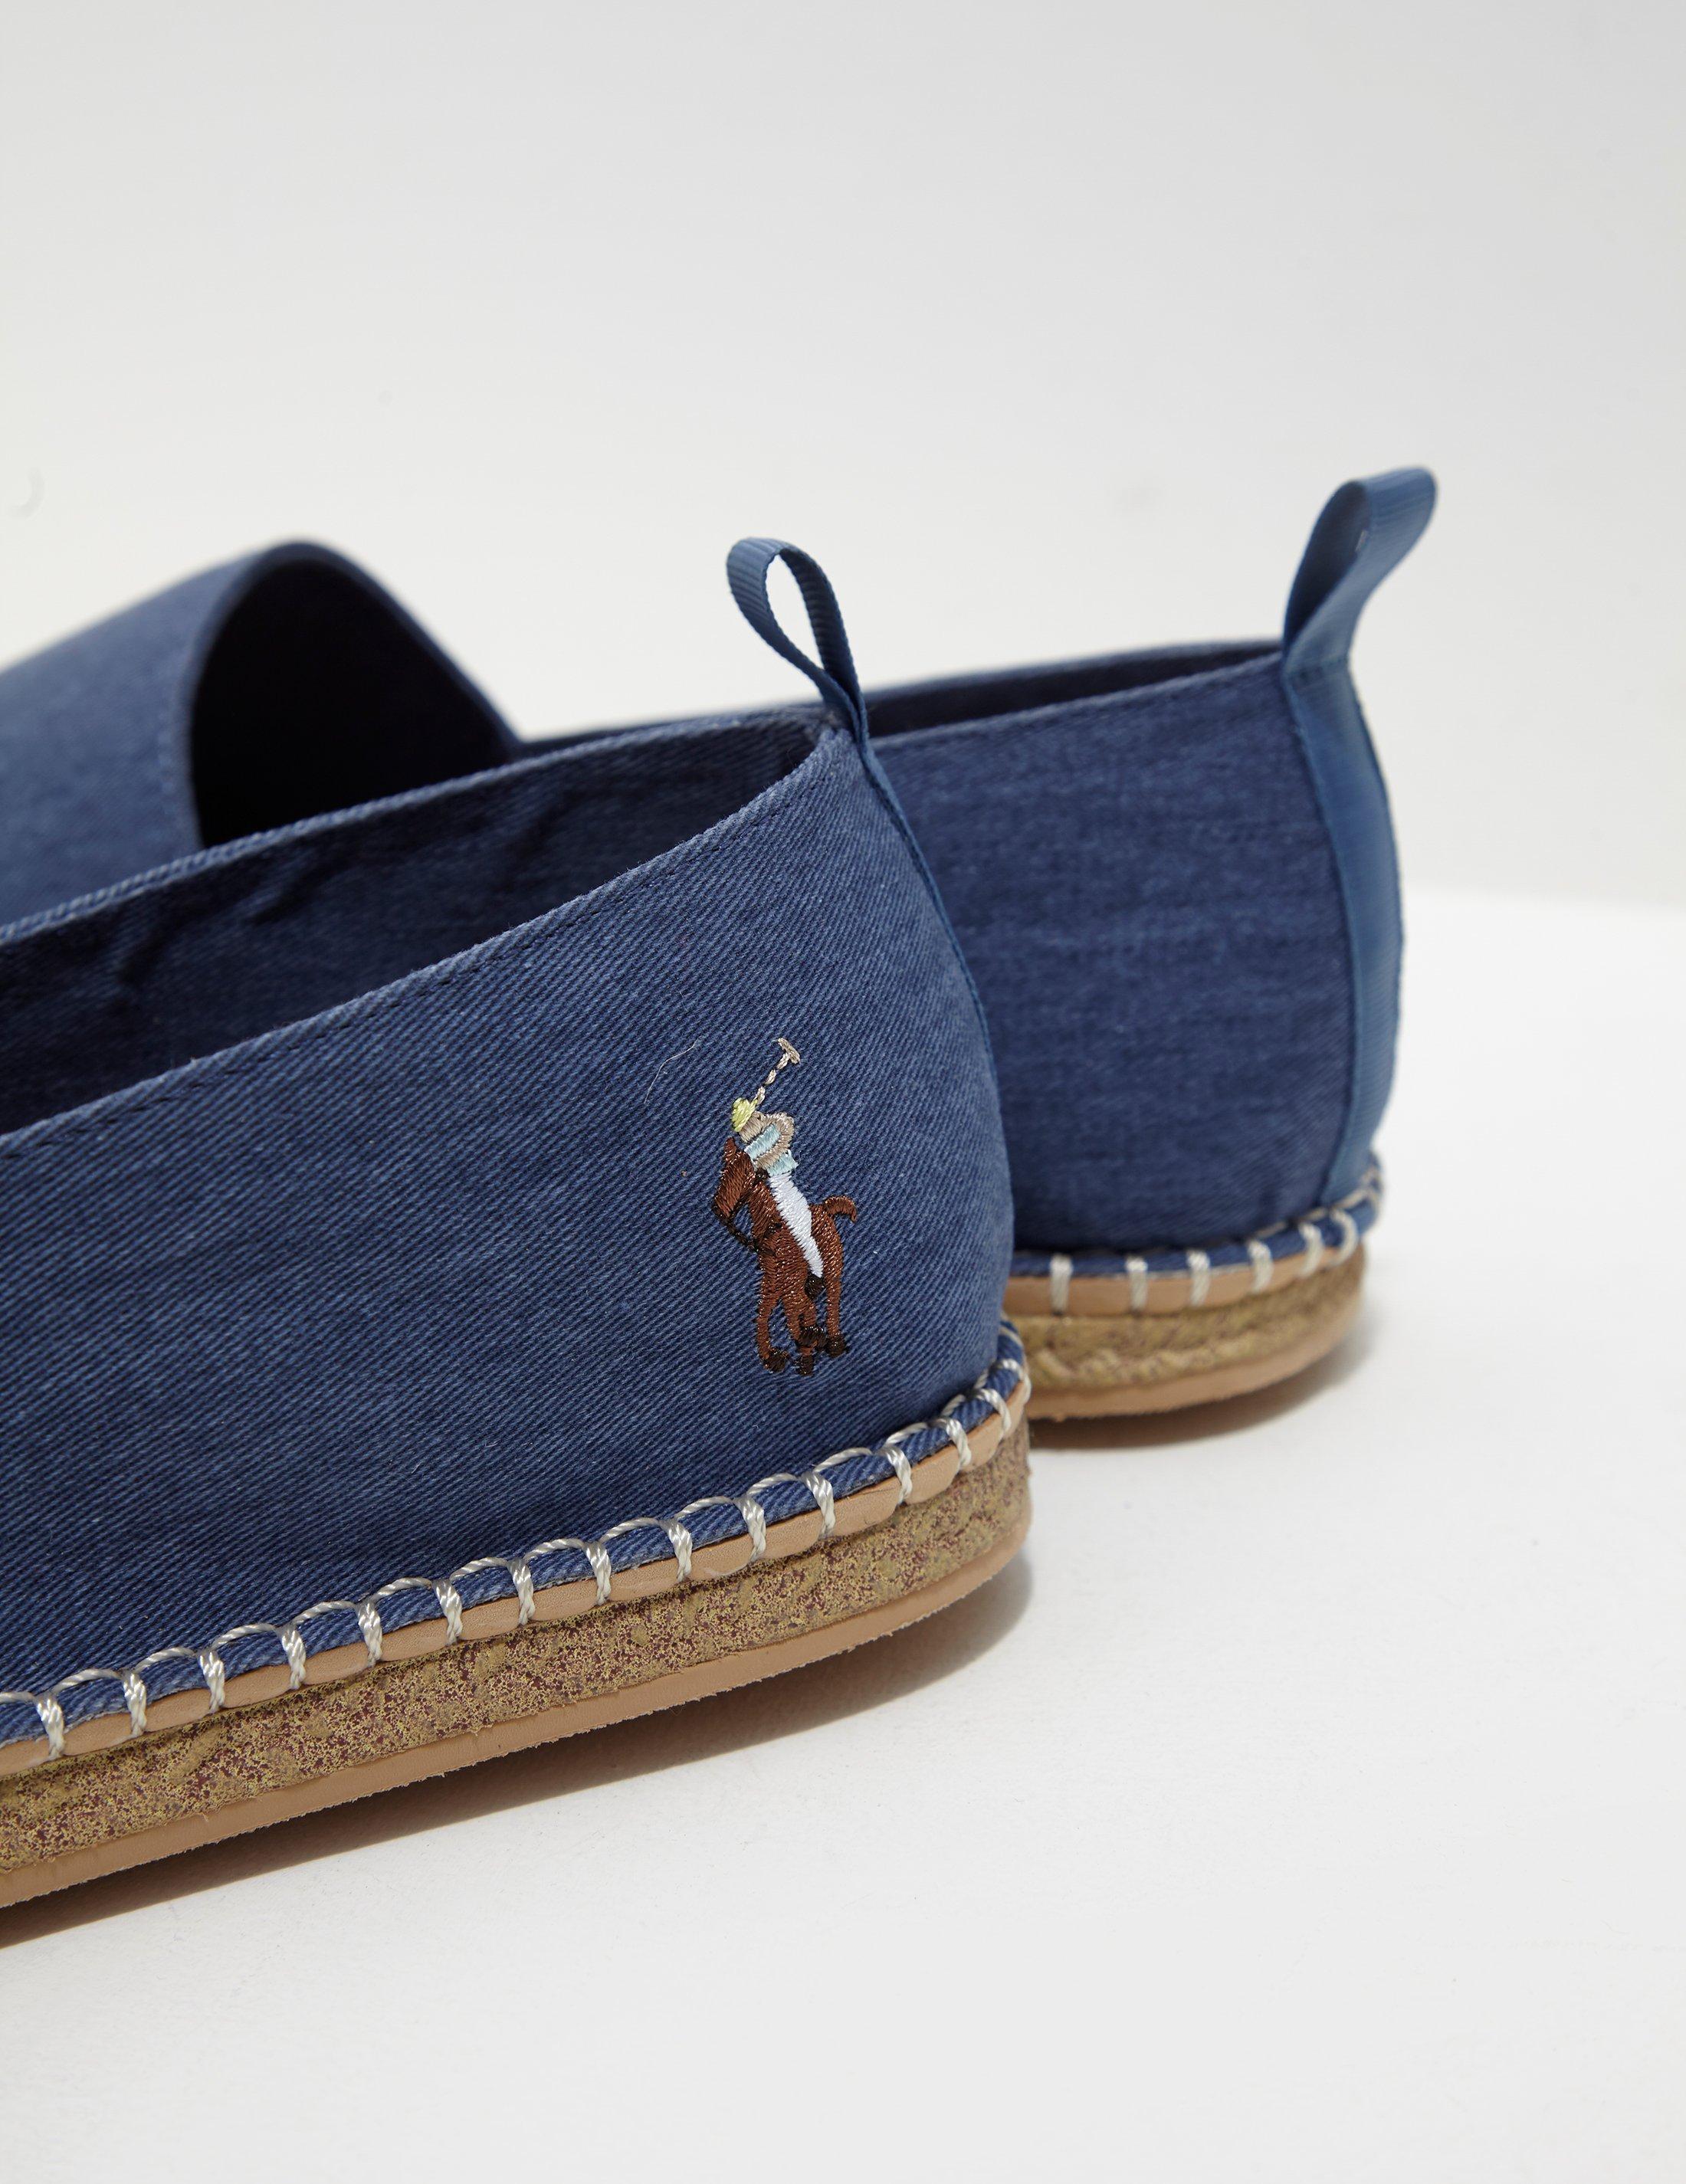 3a8f98047597 Polo Ralph Lauren  barron  Espadrille Blue in Blue for Men - Save 61% - Lyst